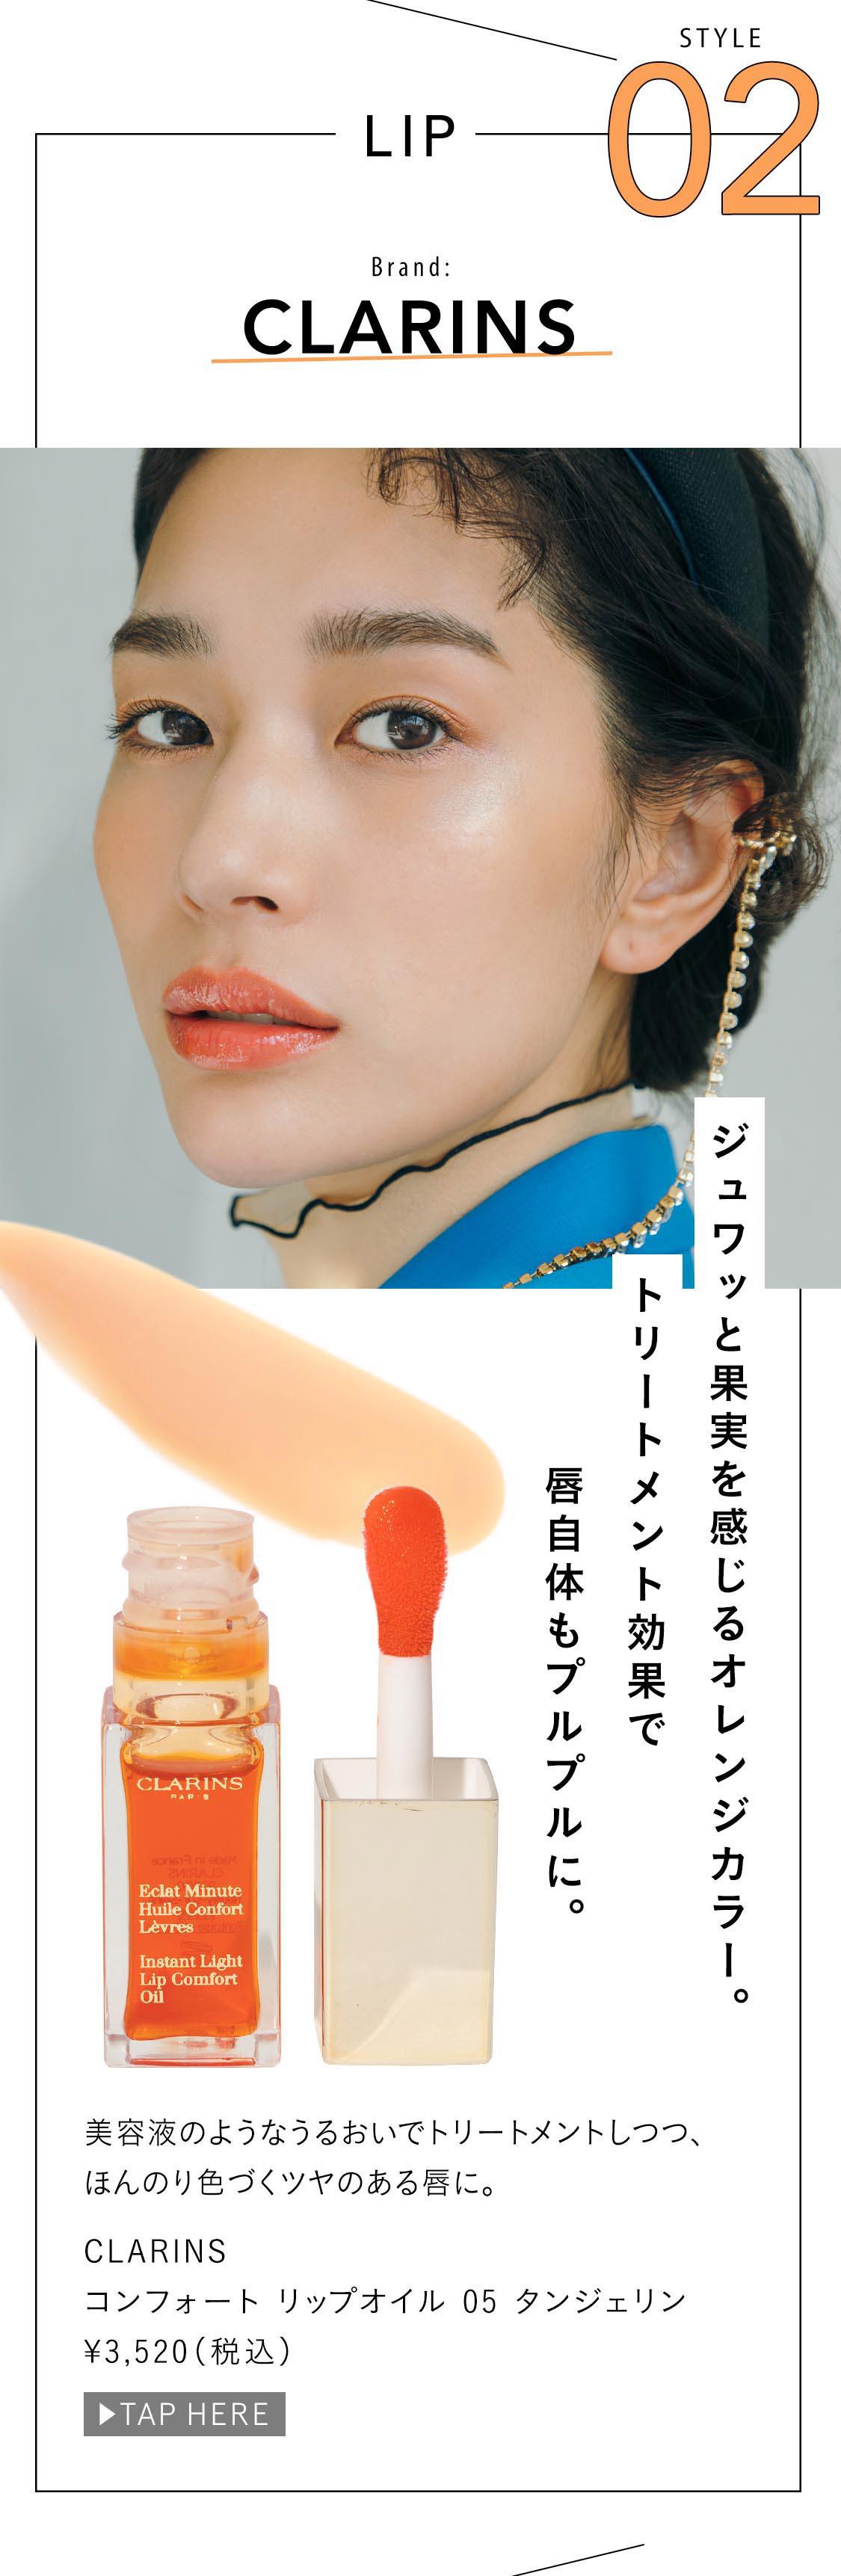 CLARINS コンフォート リップオイル 05 タンジェリン ¥3,520(税込)